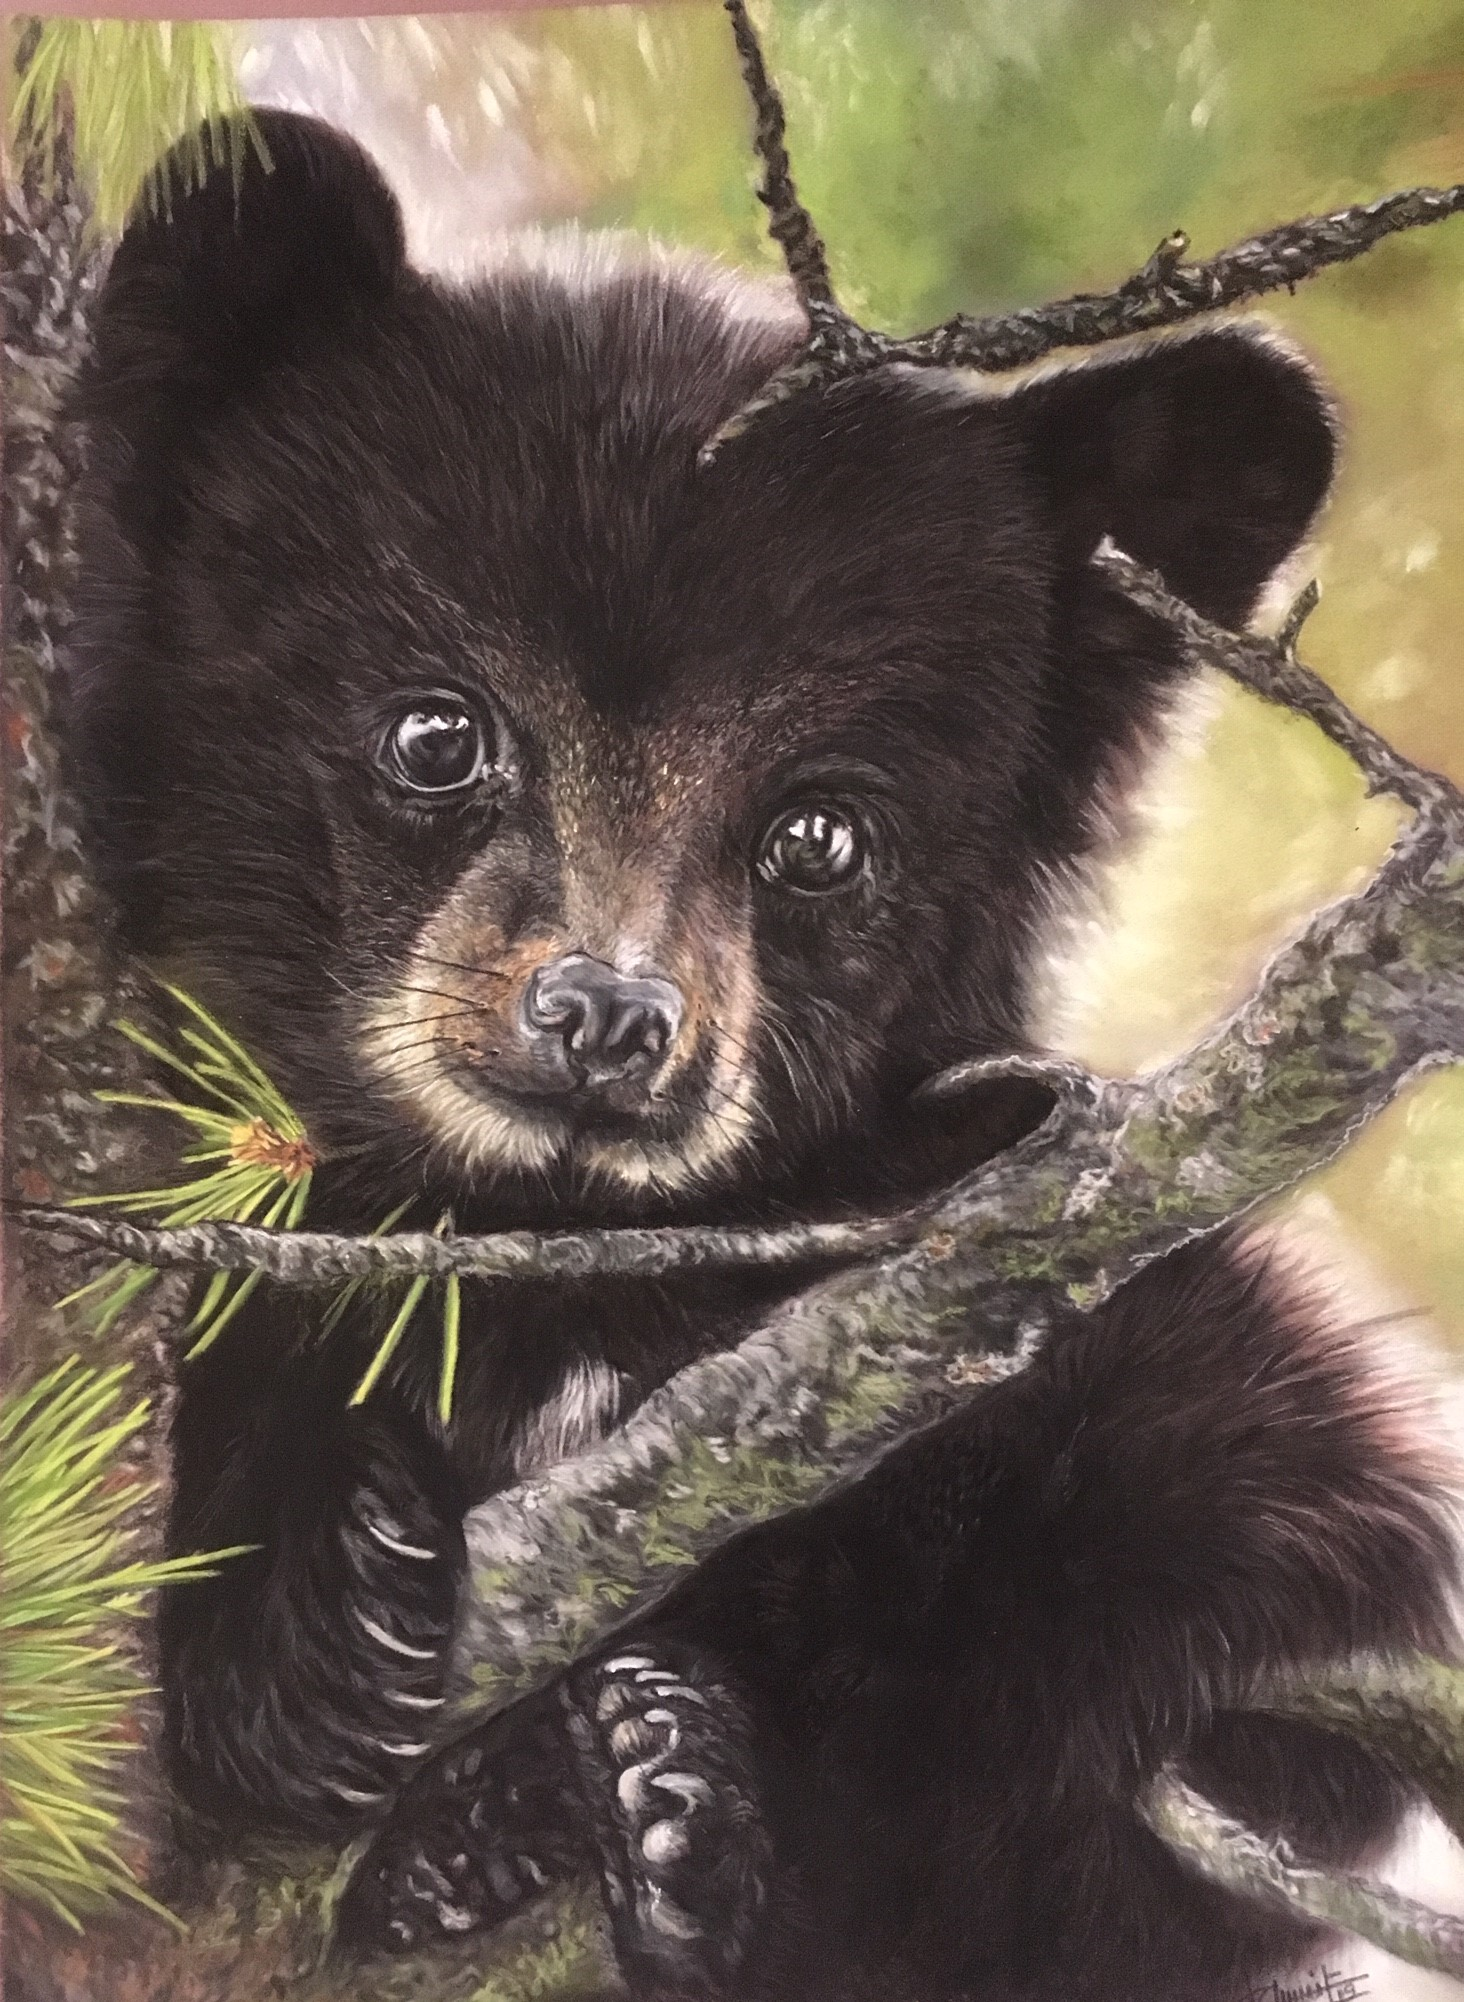 petit ours brun      150€